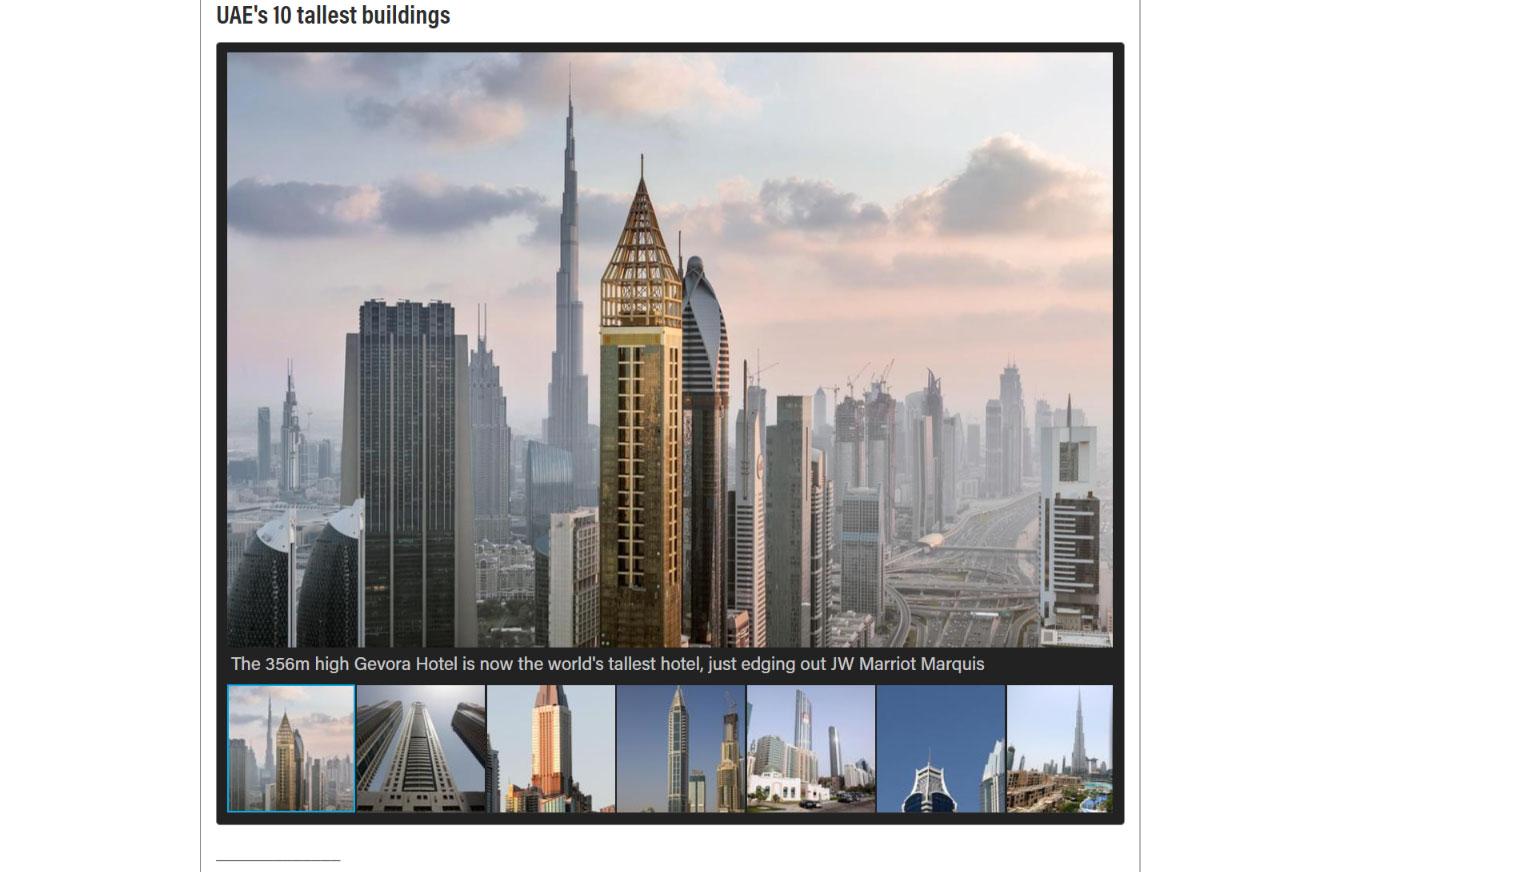 Dh25 million Burj Khalifa penthouse